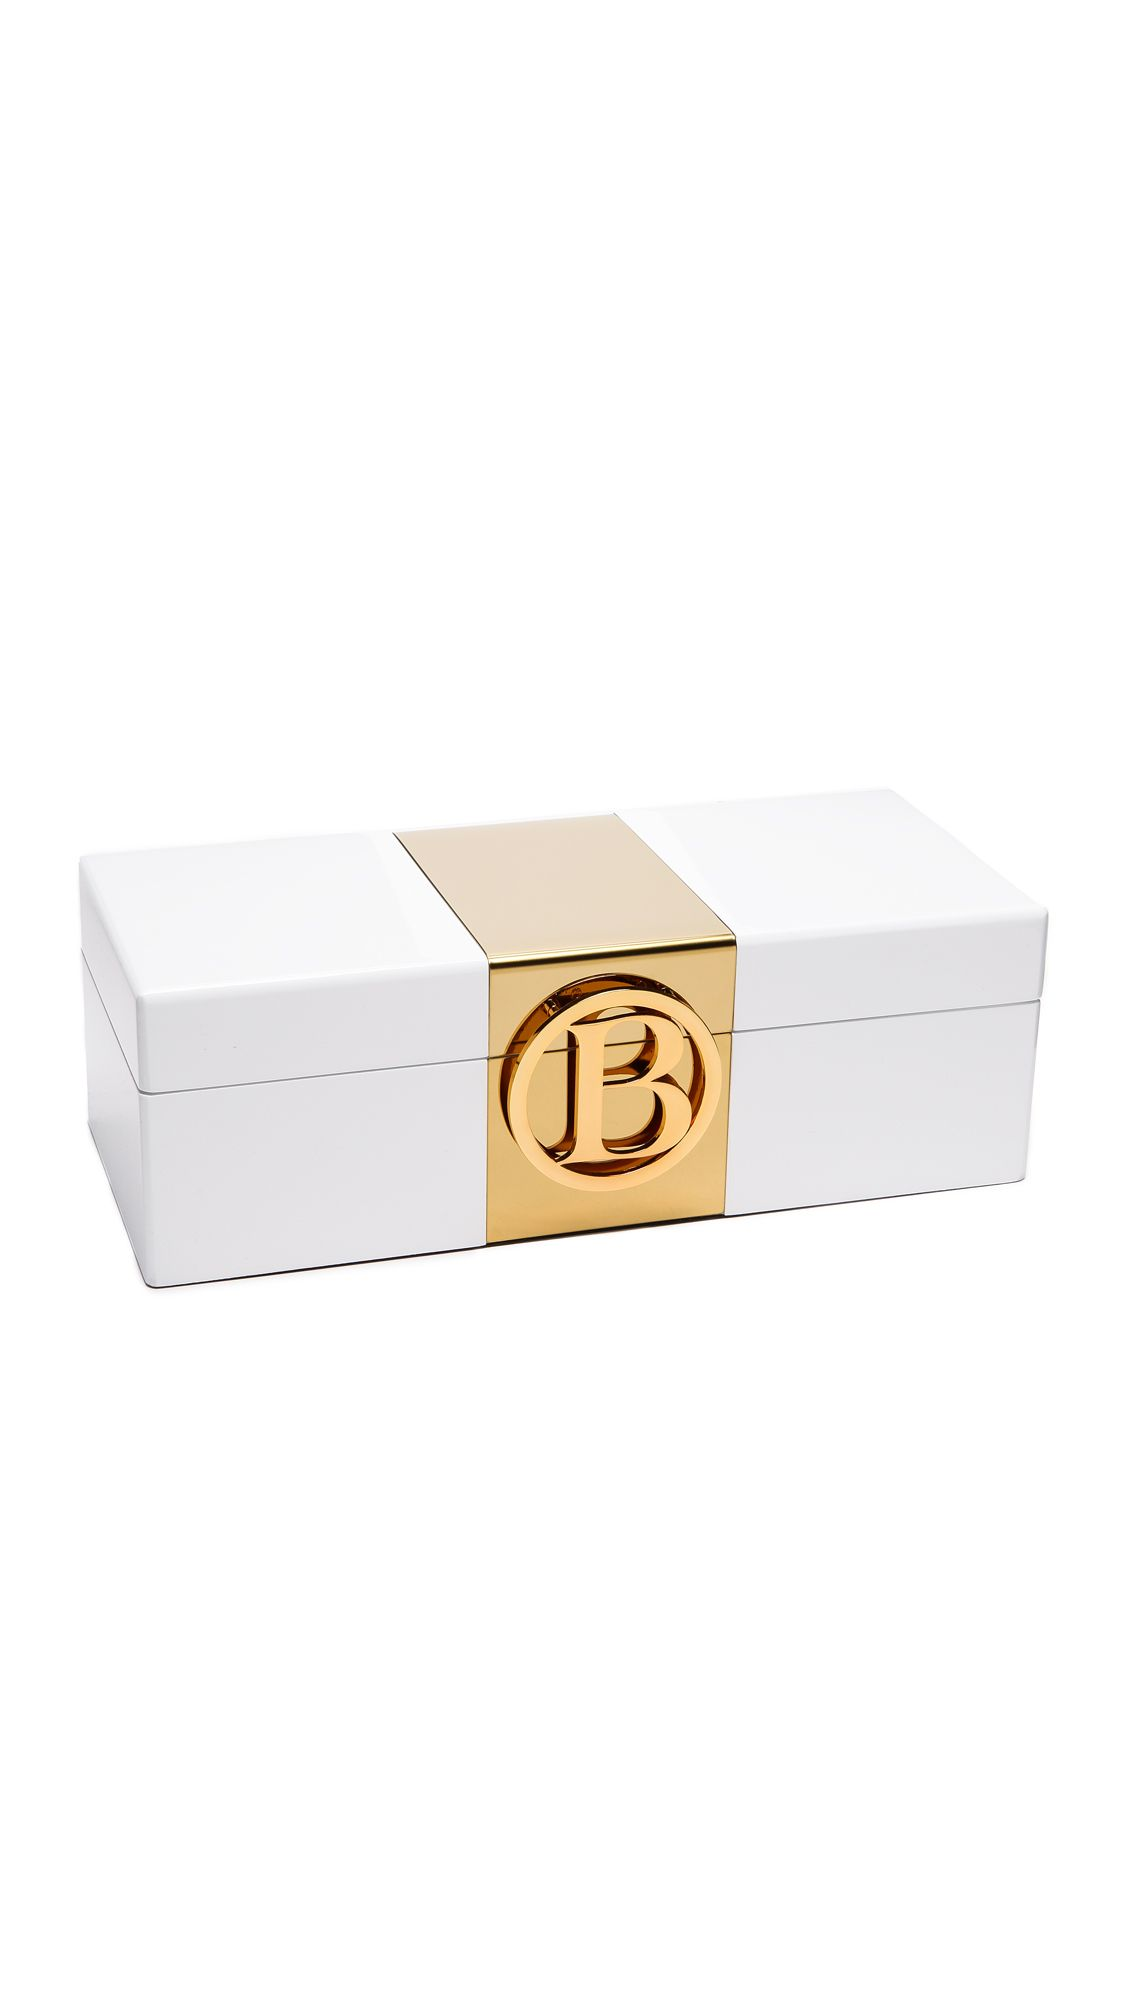 Monogram Jewelry Box Monogram jewelry, Jewelry box, Monogram